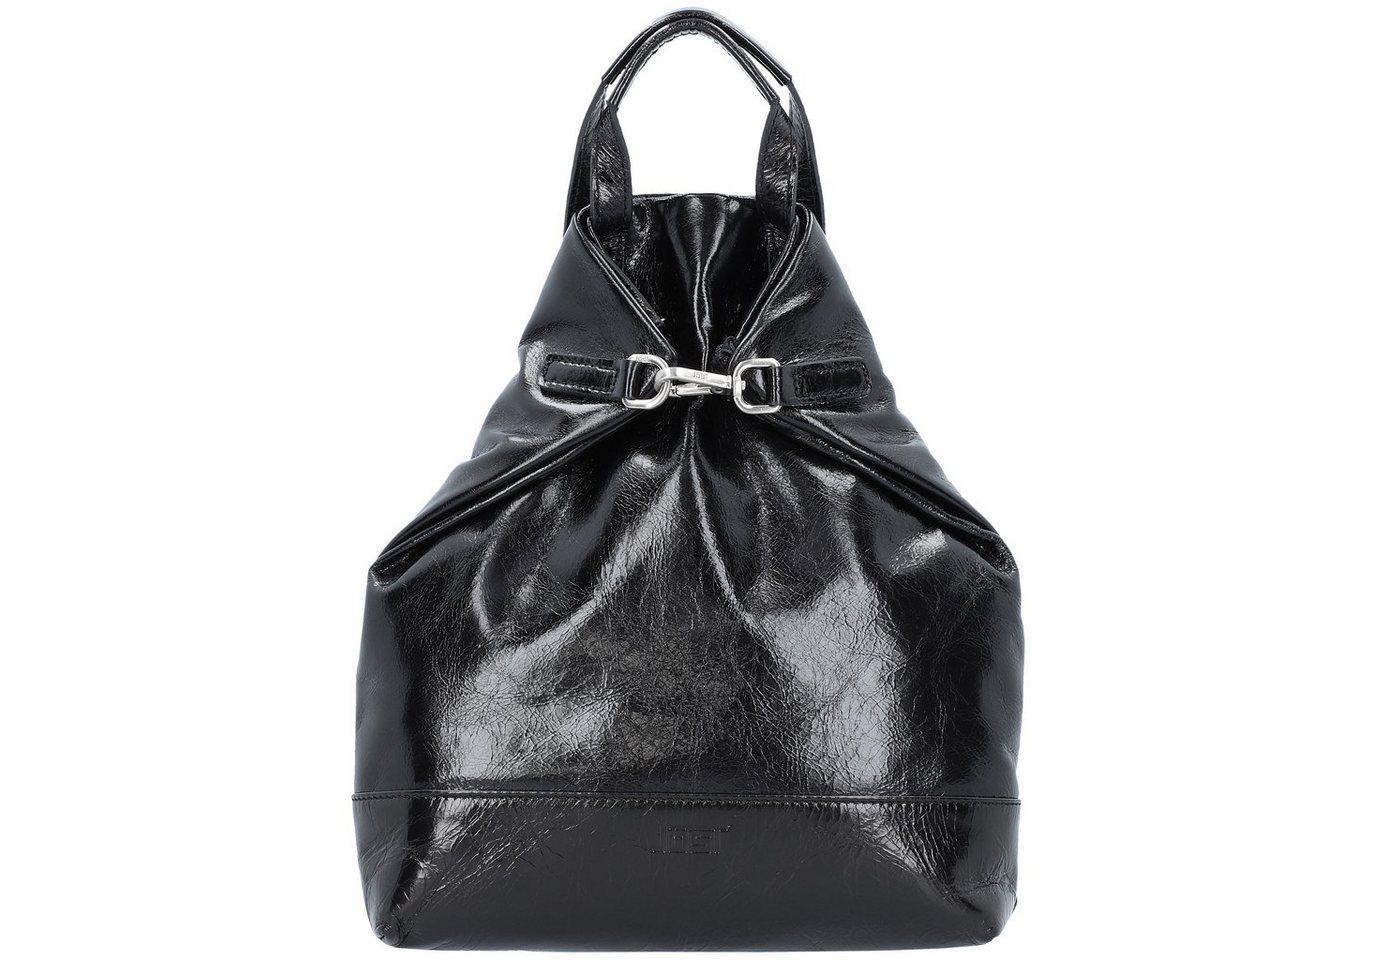 Damen Jost Boda X-Change City Rucksack Leder 30 cm schwarz | 04025307742879